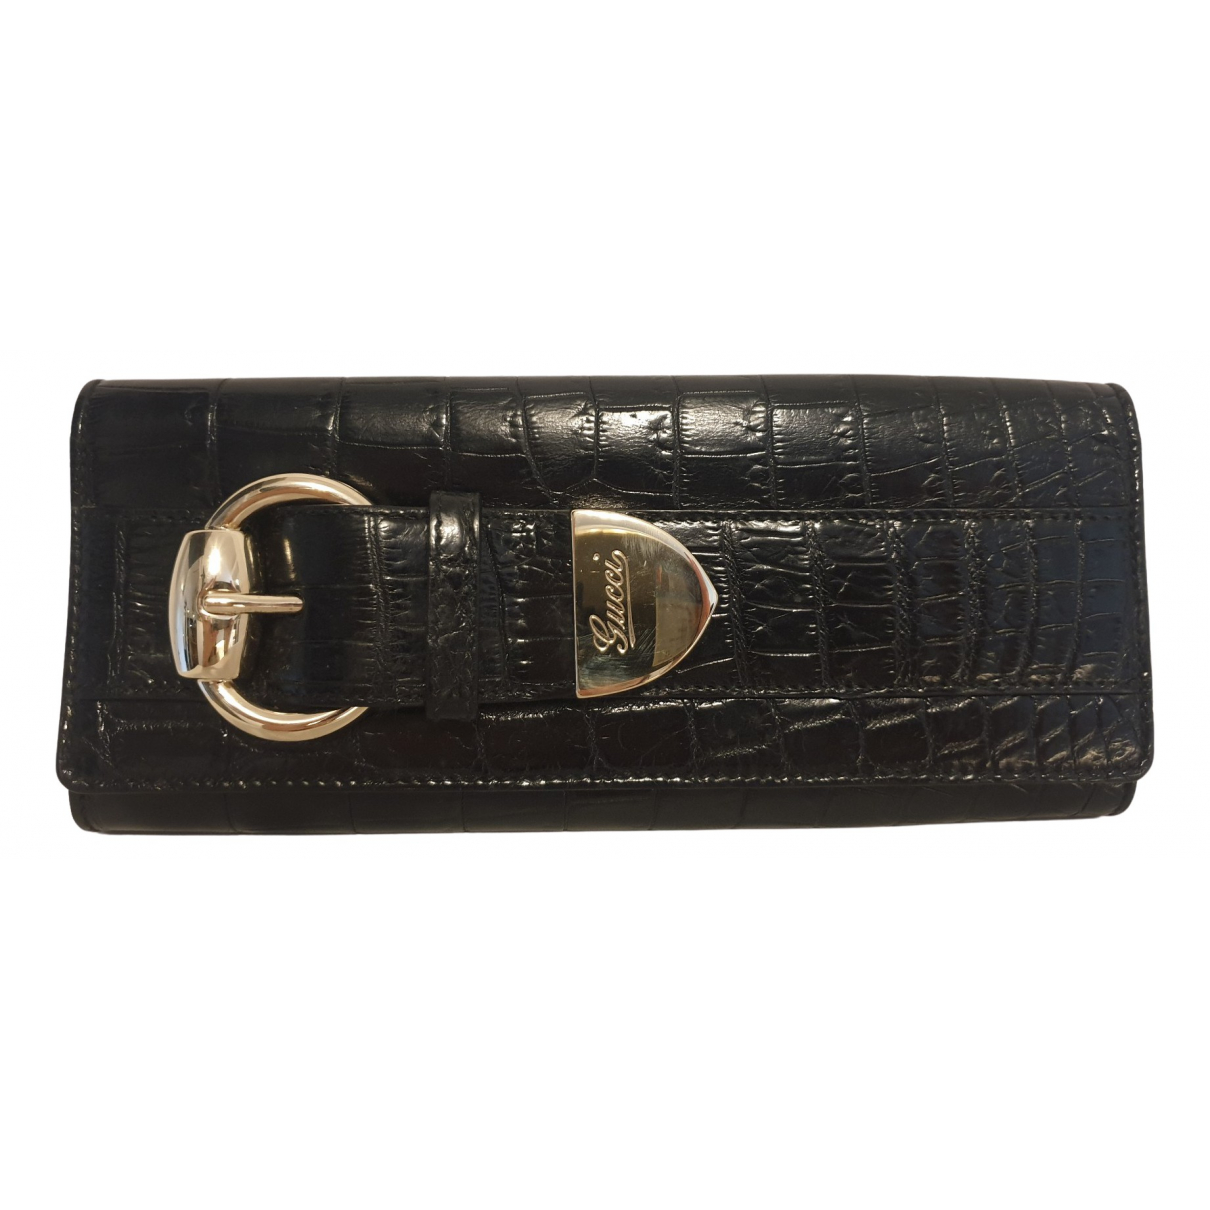 Gucci N Black Crocodile Clutch bag for Women N